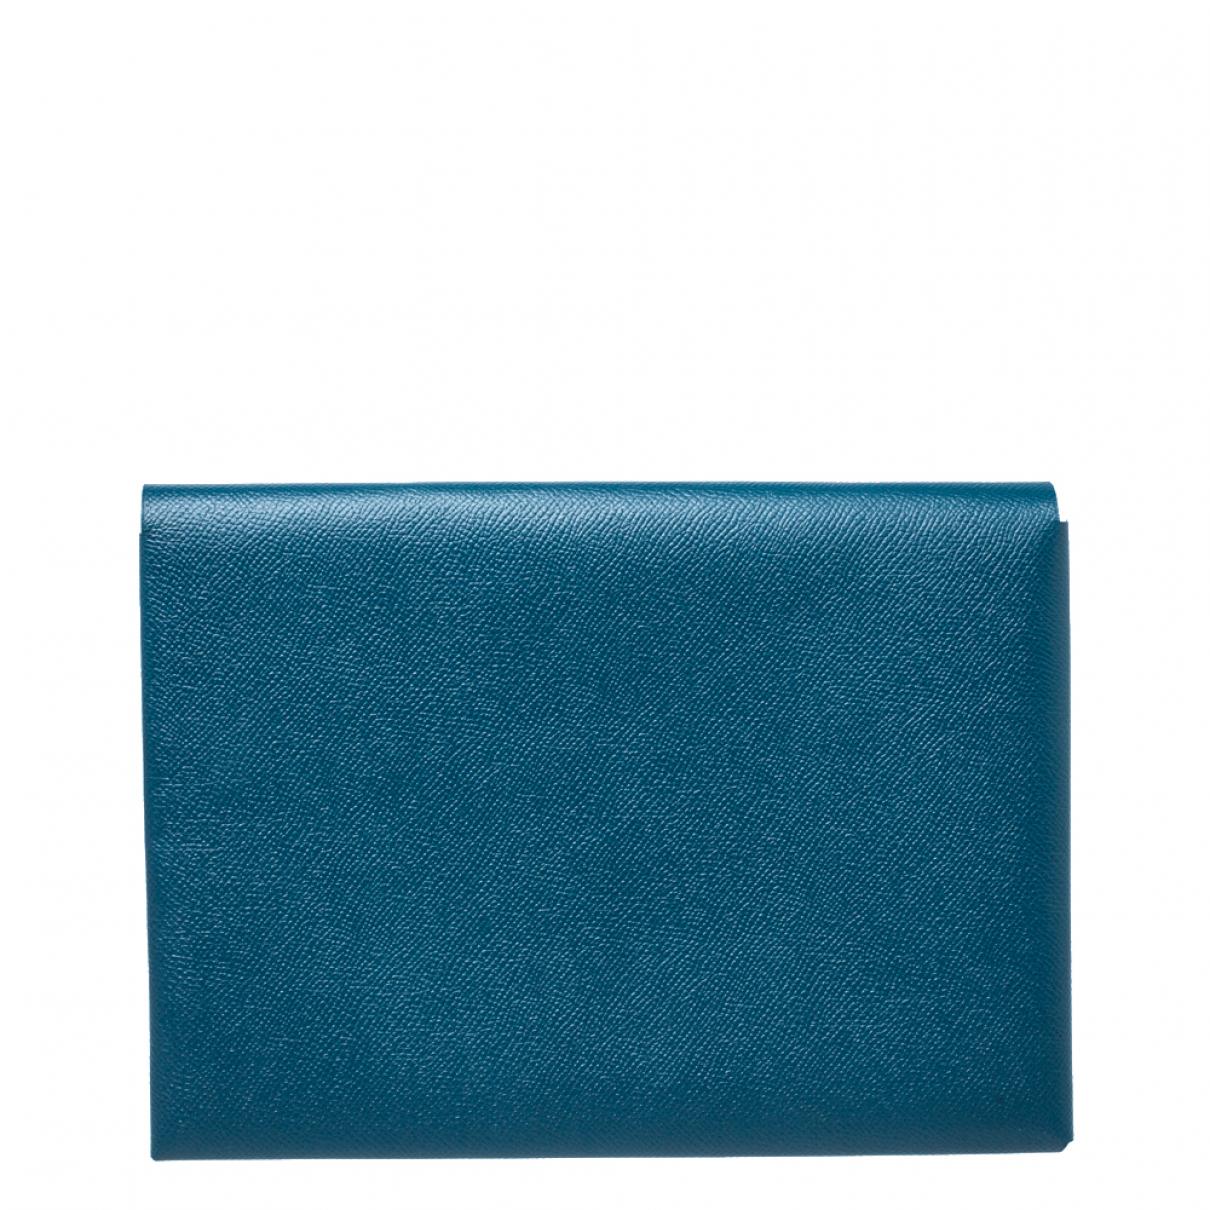 Hermès N Khaki Leather handbag for Women N